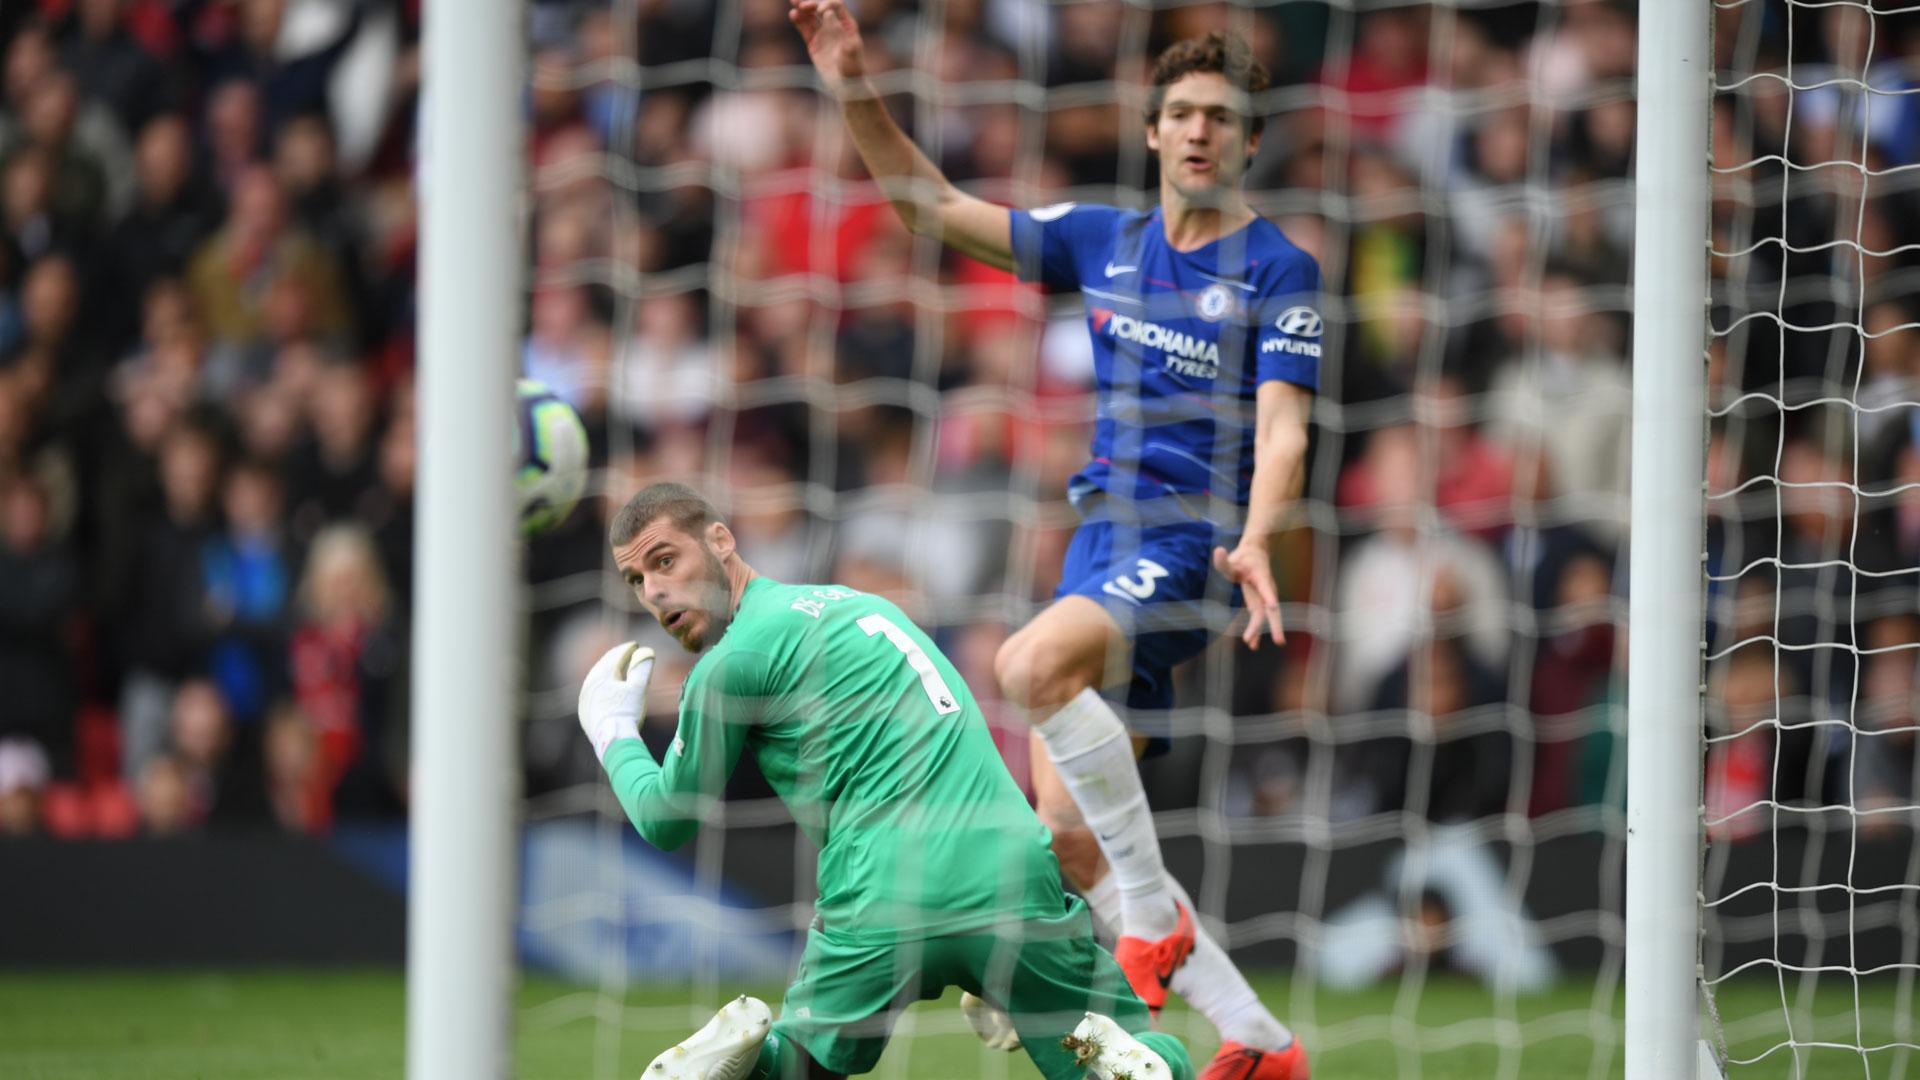 Fin de saison pour Eric Bailly — Manchester United